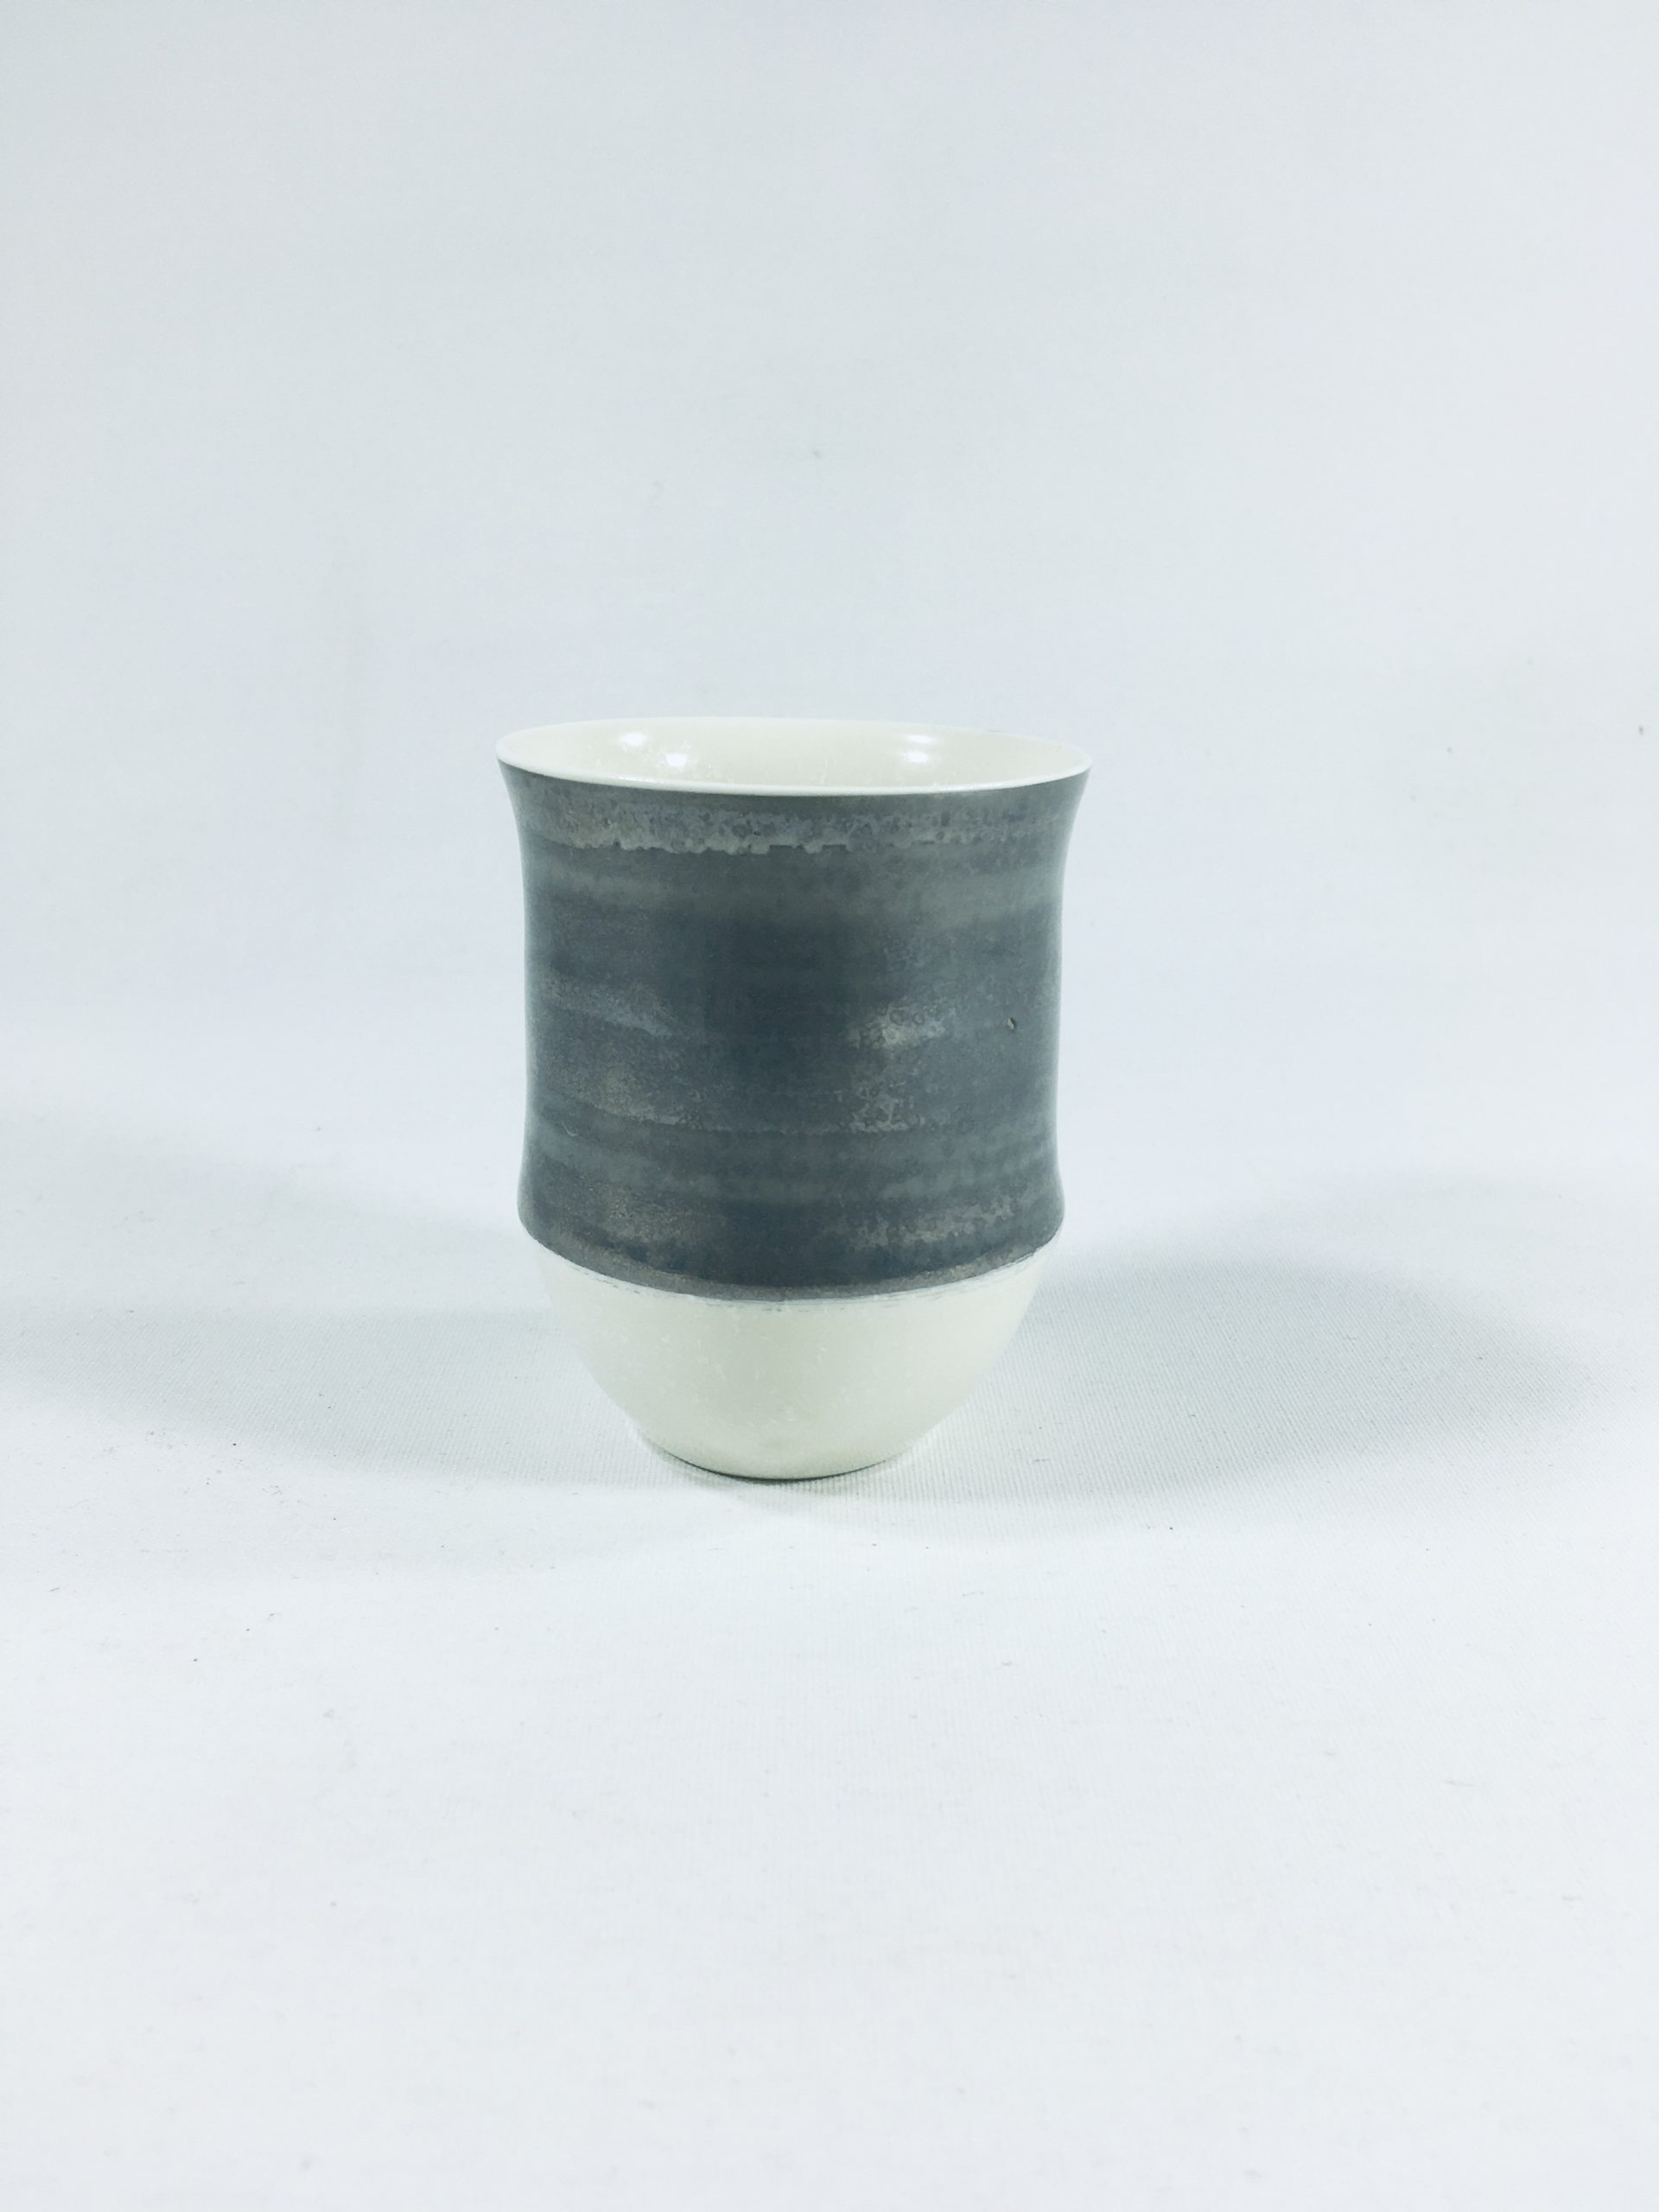 Porzellanbecher-Unikat mit breitem Silberrand II Bild 2